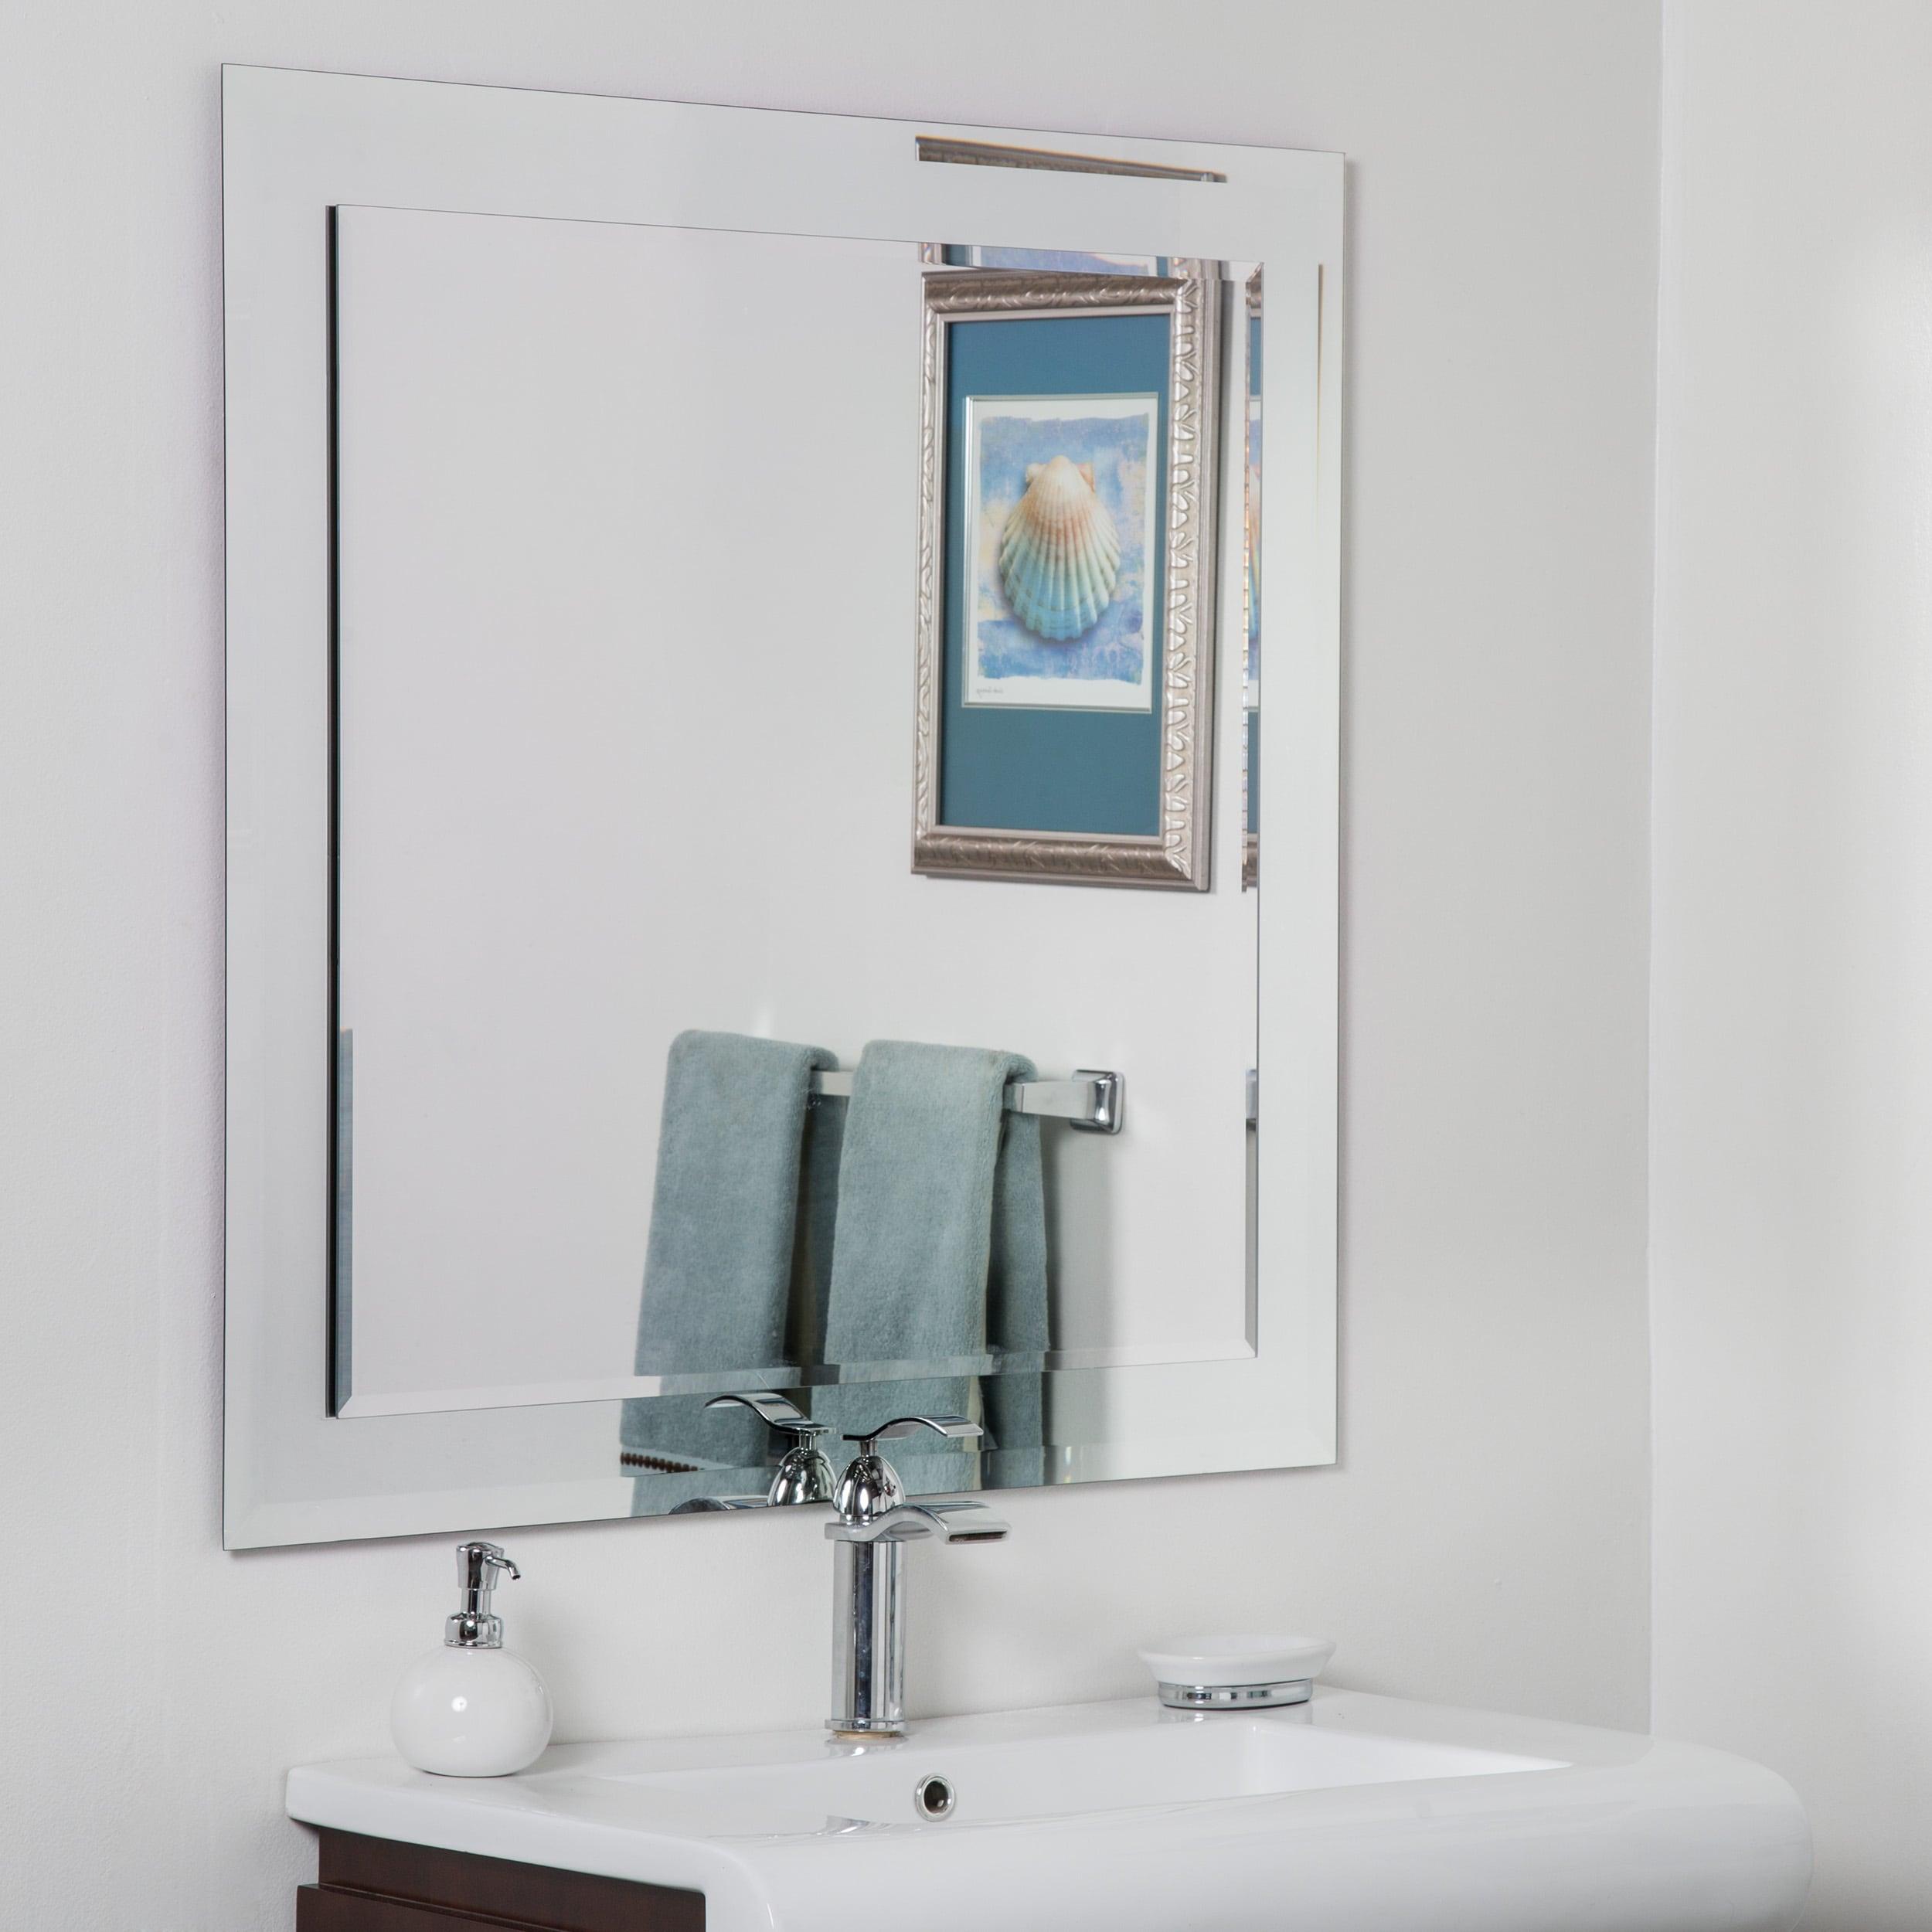 Shop St. Petersburg Modern Bathroom Mirror - Silver - N/A - Free ...